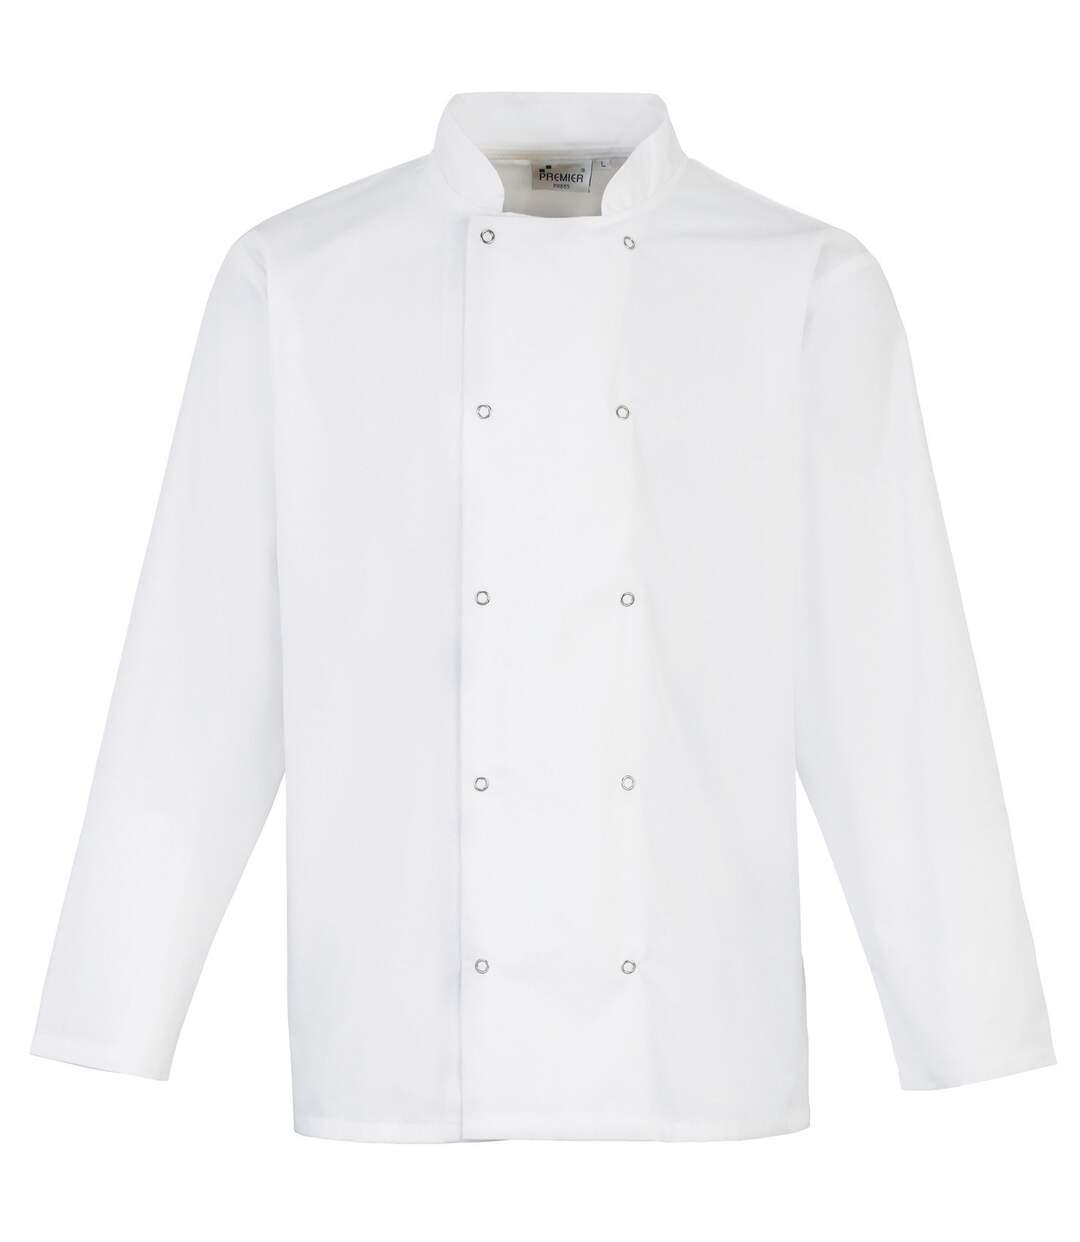 Premier Studded Front Long Sleeve Chefs Jacket / Chefswear (Pack of 2) (White) - UTRW6820